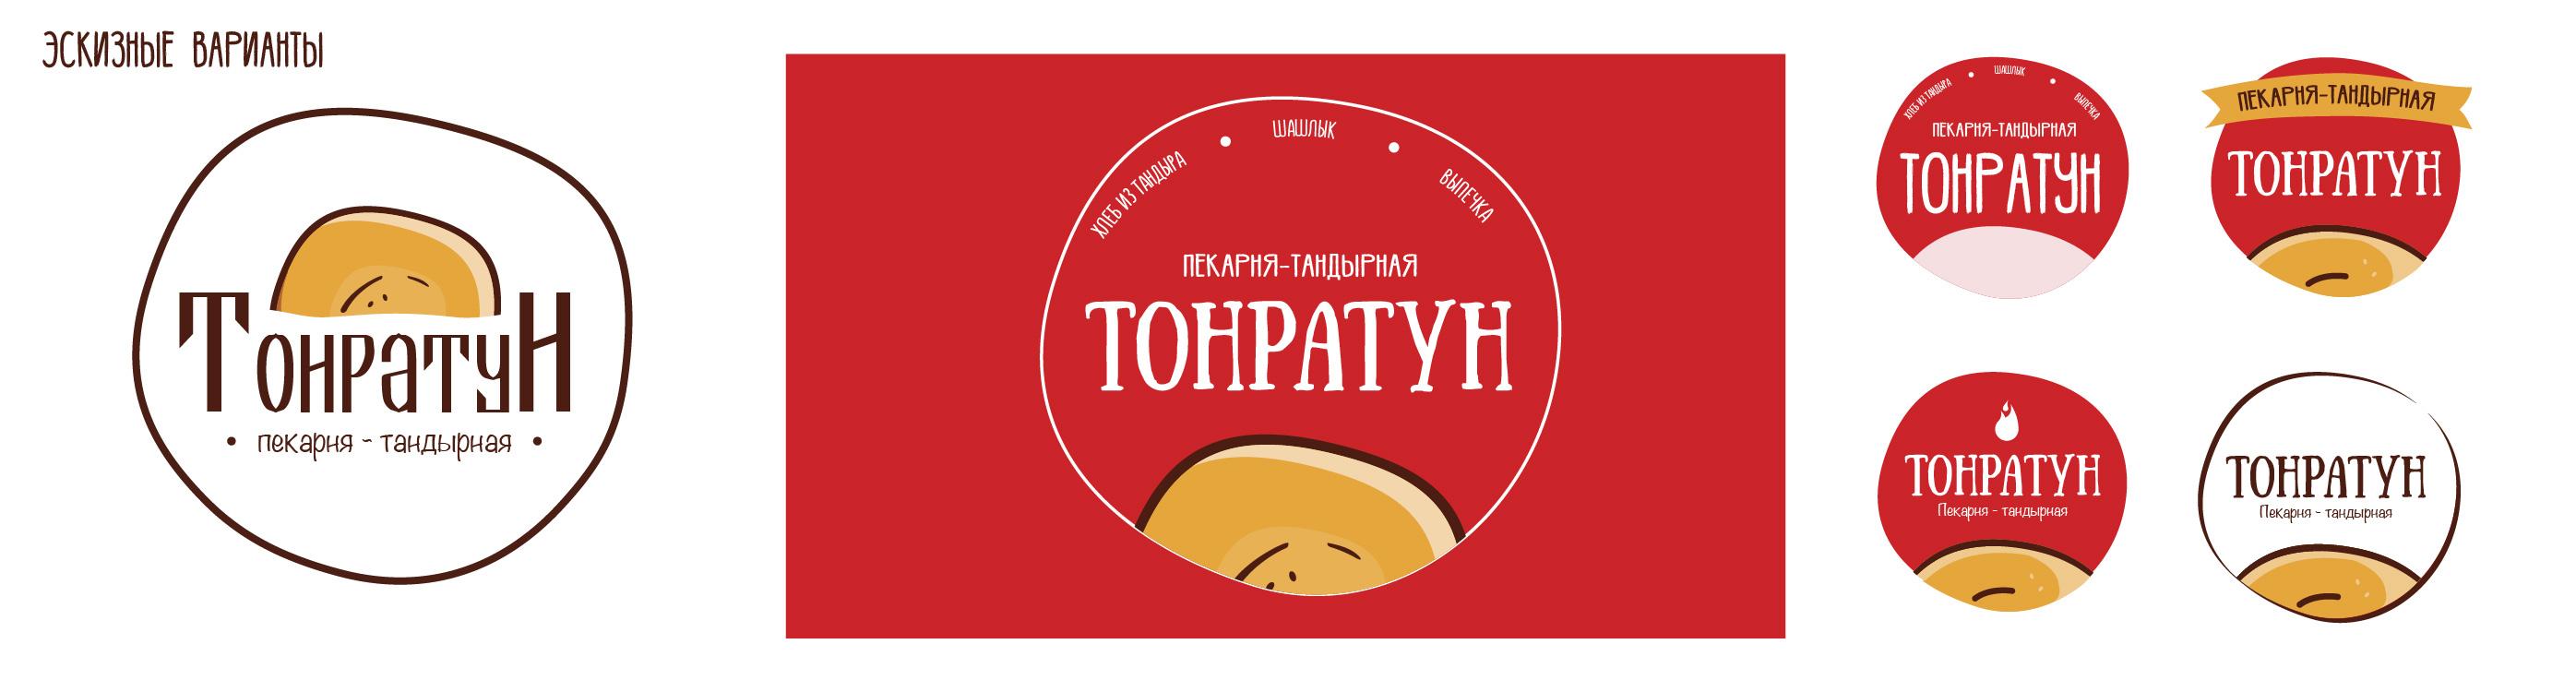 Логотип для Пекарни-Тандырной  фото f_1055d901e54a1ea9.jpg